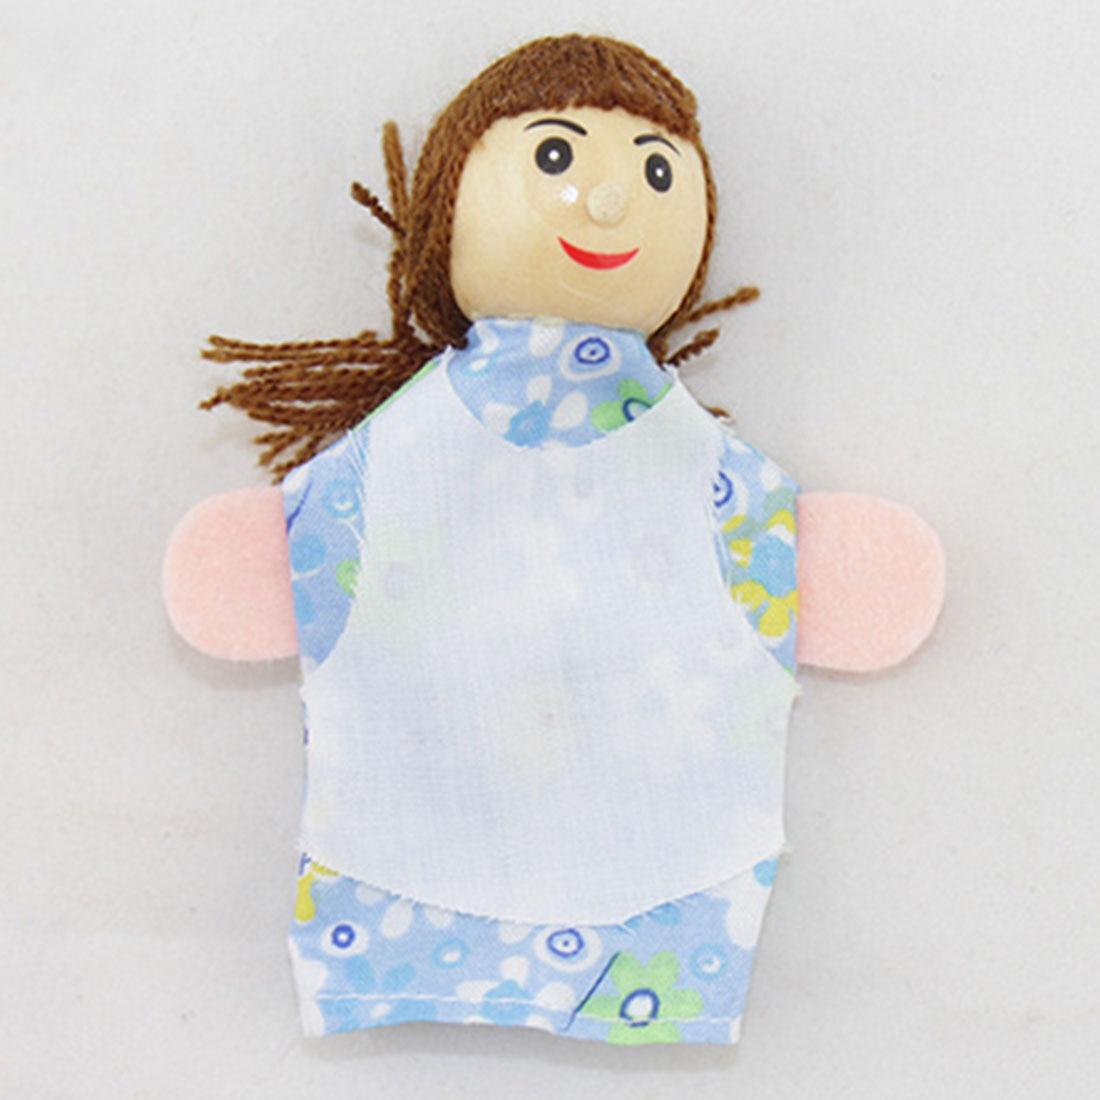 Surwish-6PCSSet-Family-Finger-Puppets-Storytelling-Doll-Kids-Children-Baby-Educational-Toys-2